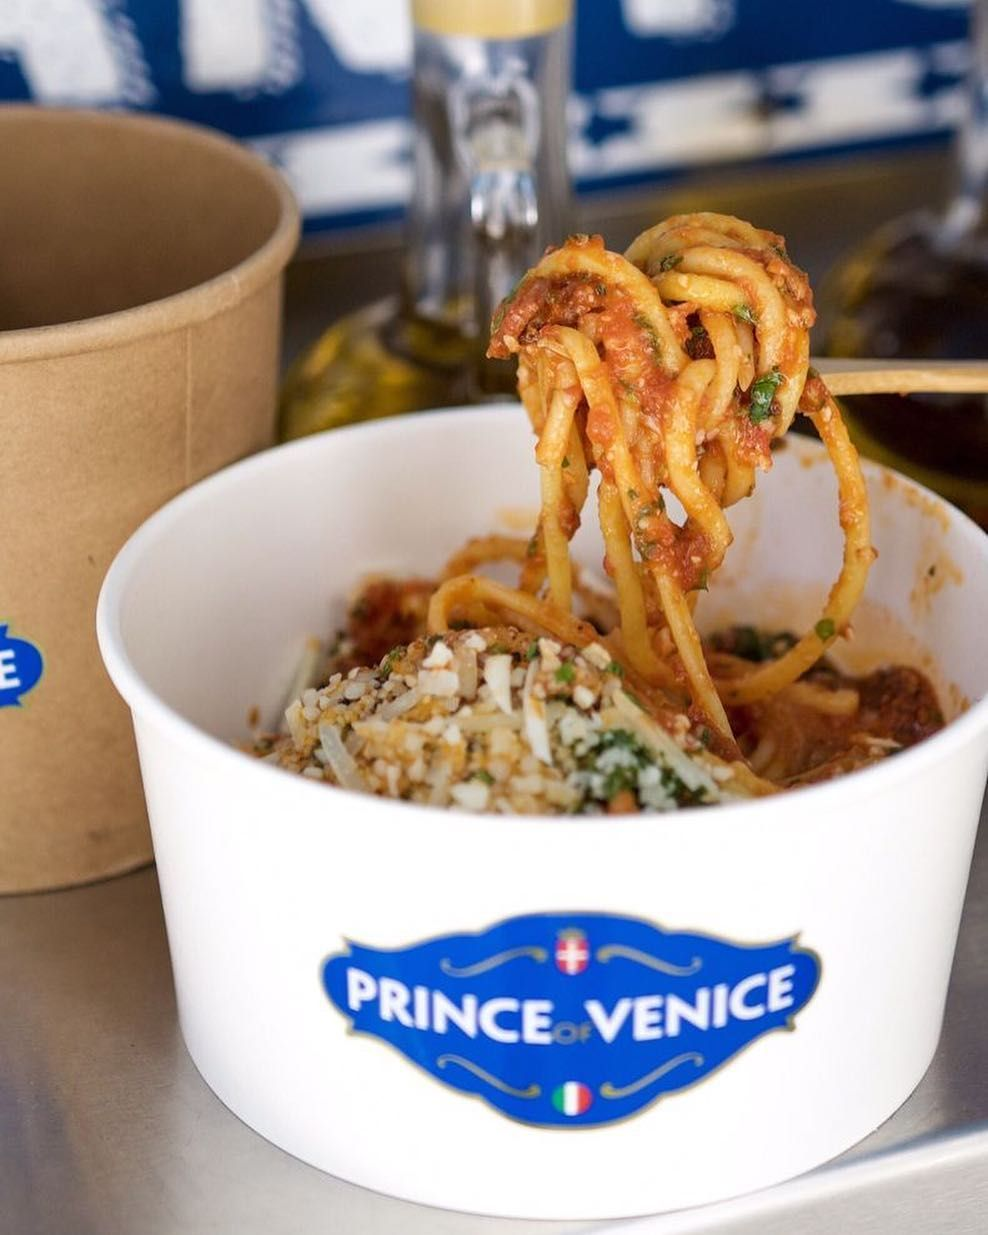 Park Art My WordPress Blog_Prince Of Venice Food Truck Instagram